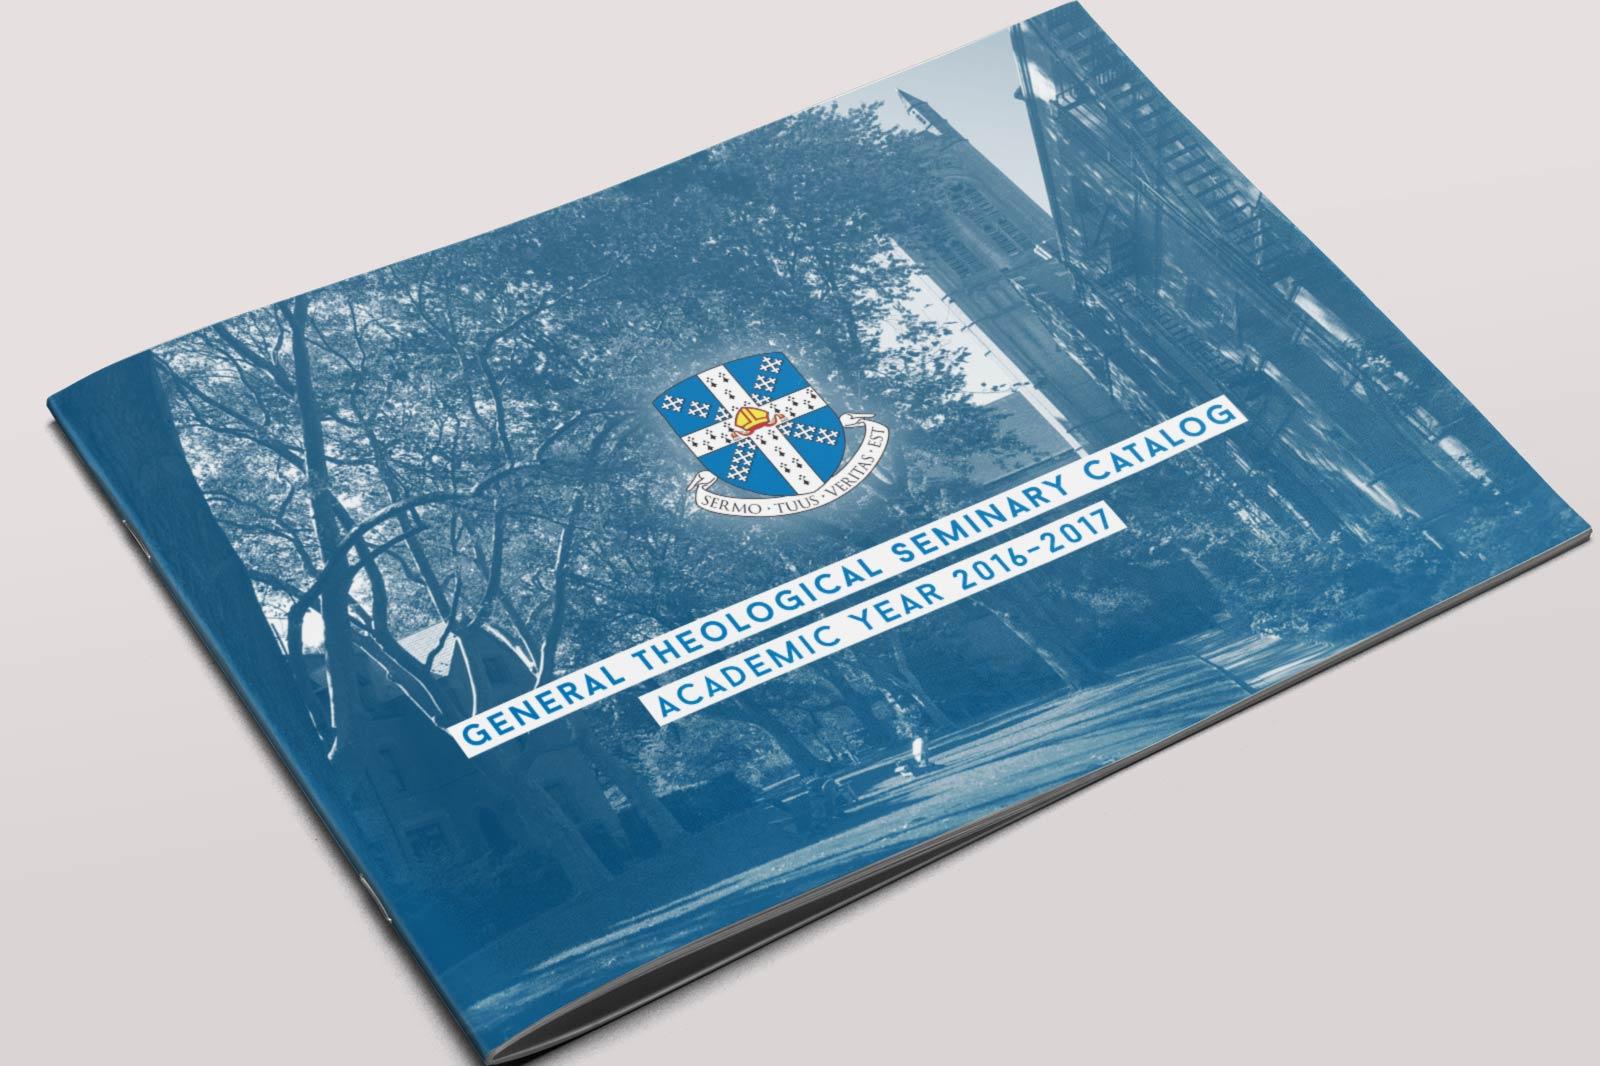 The General Seminary school catalog